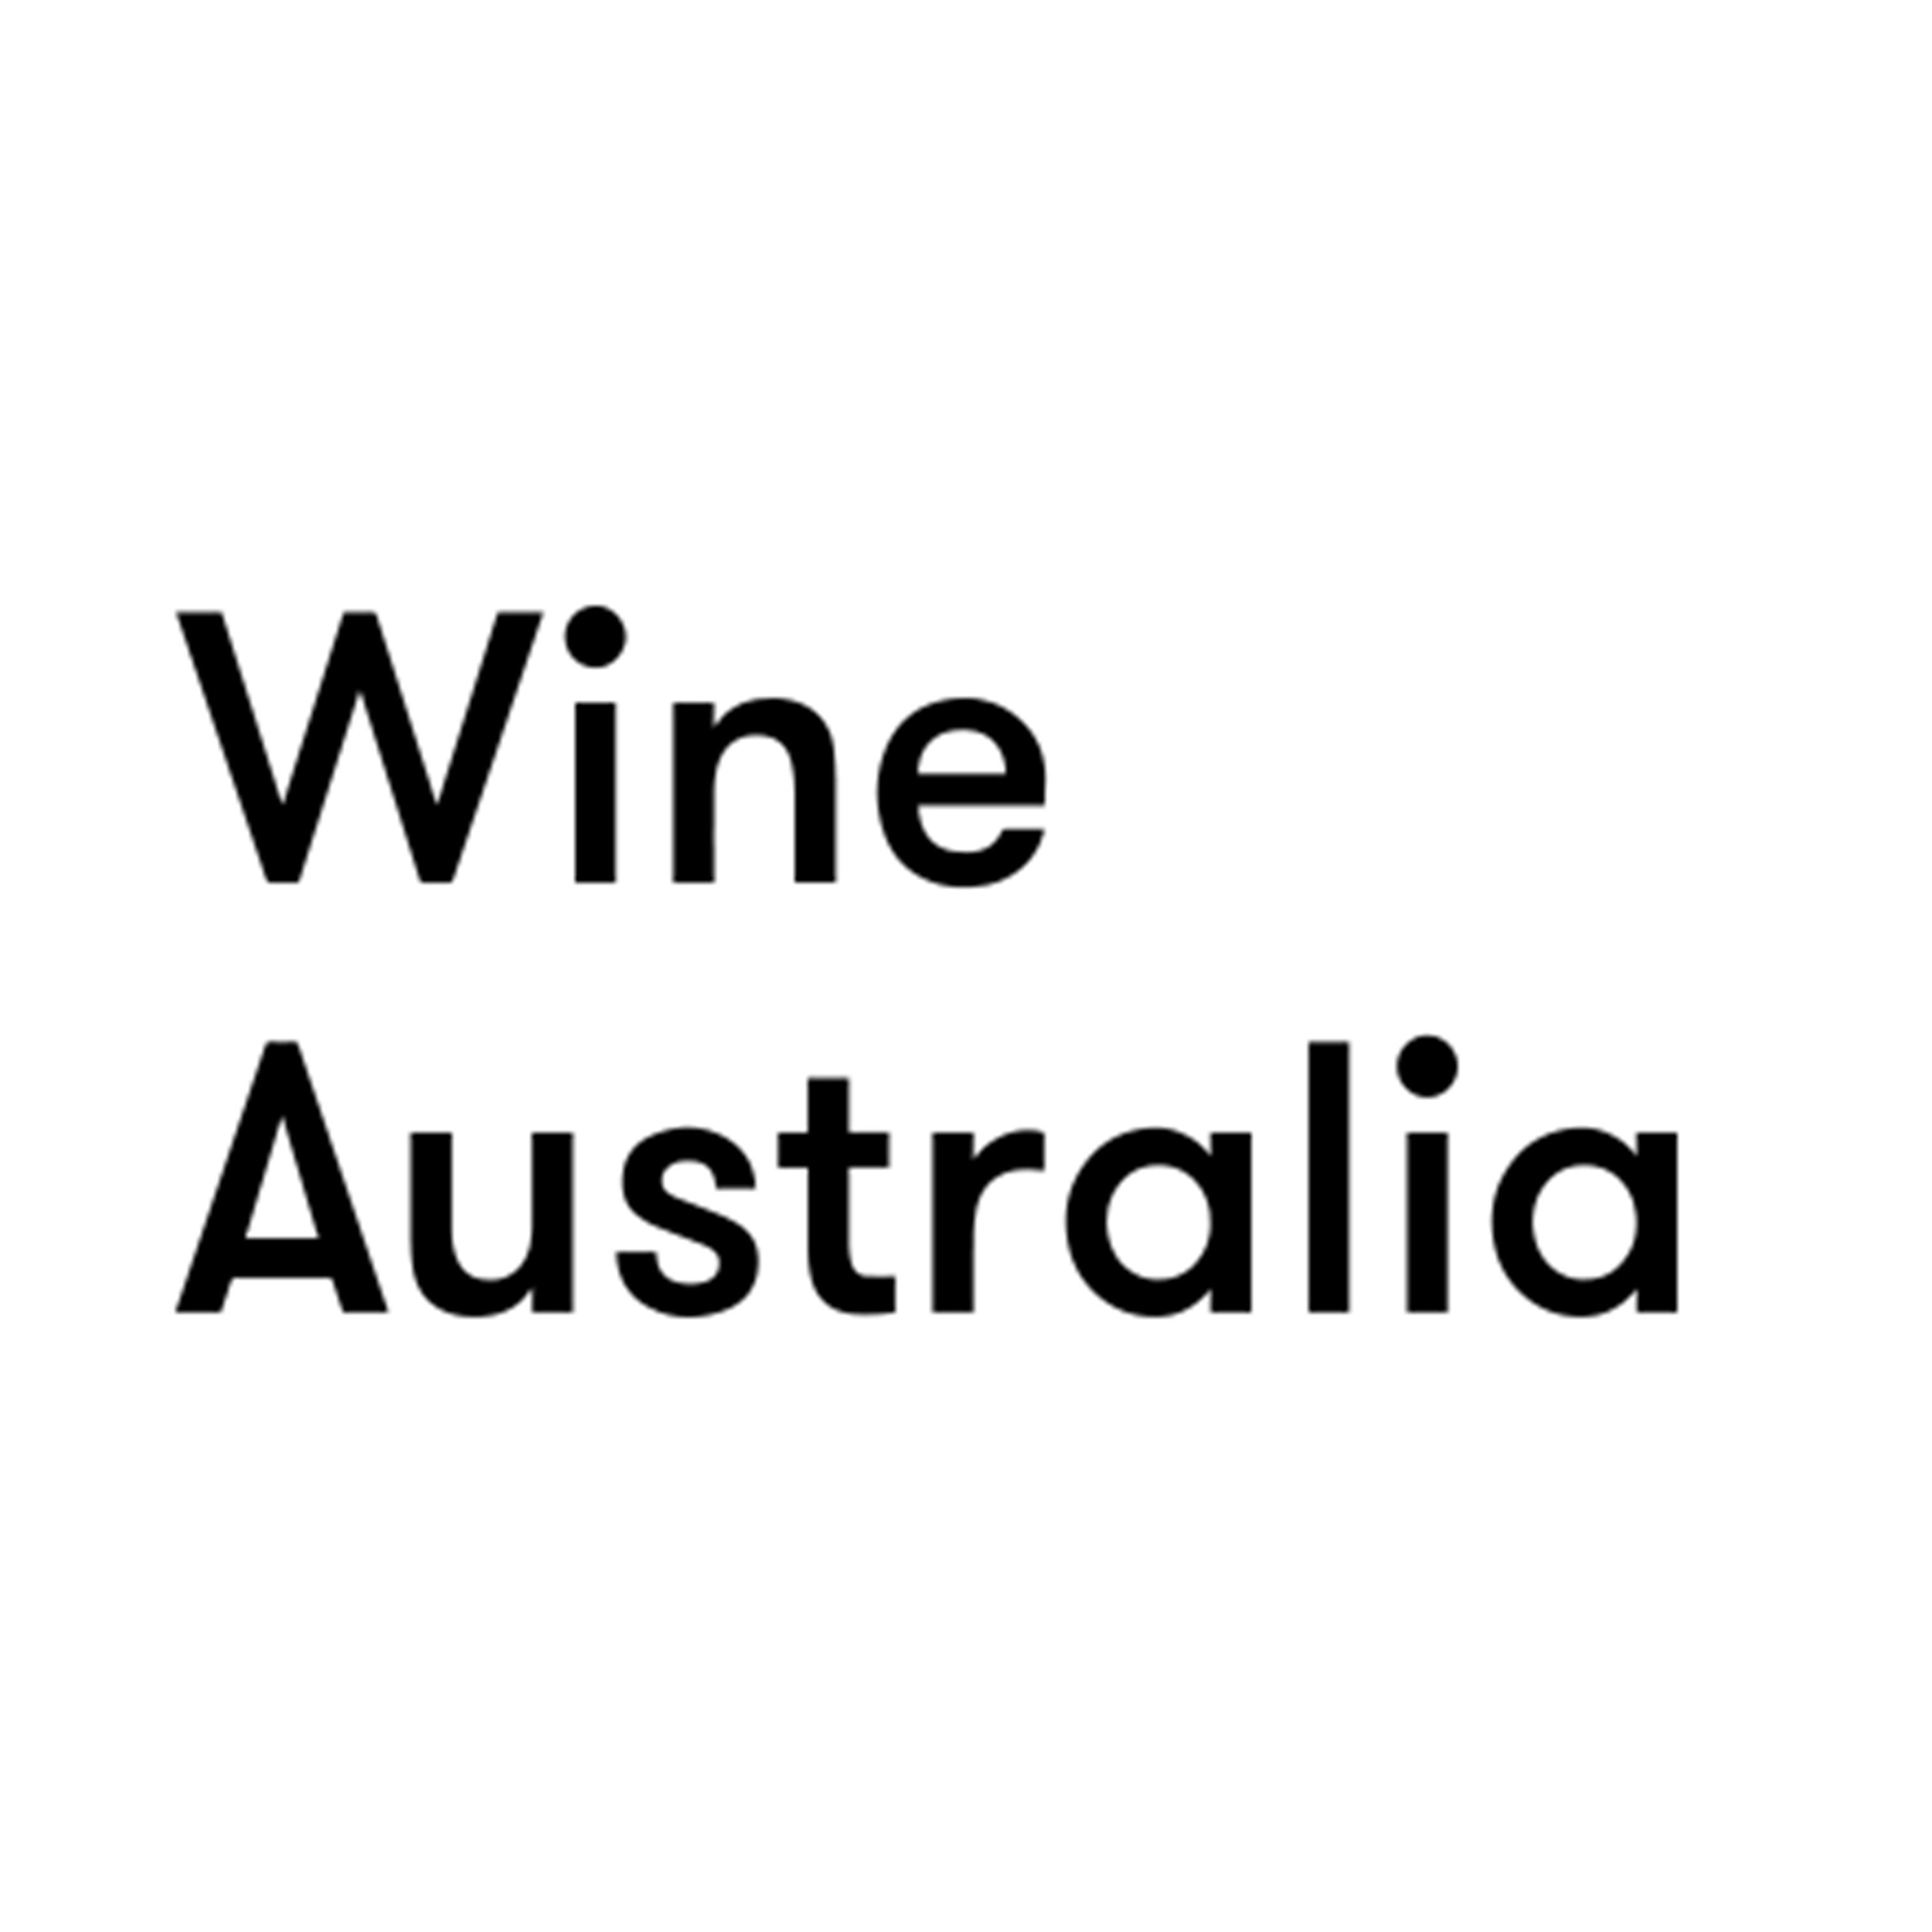 Wine Australia - Clients - Case Studies & Testimonials